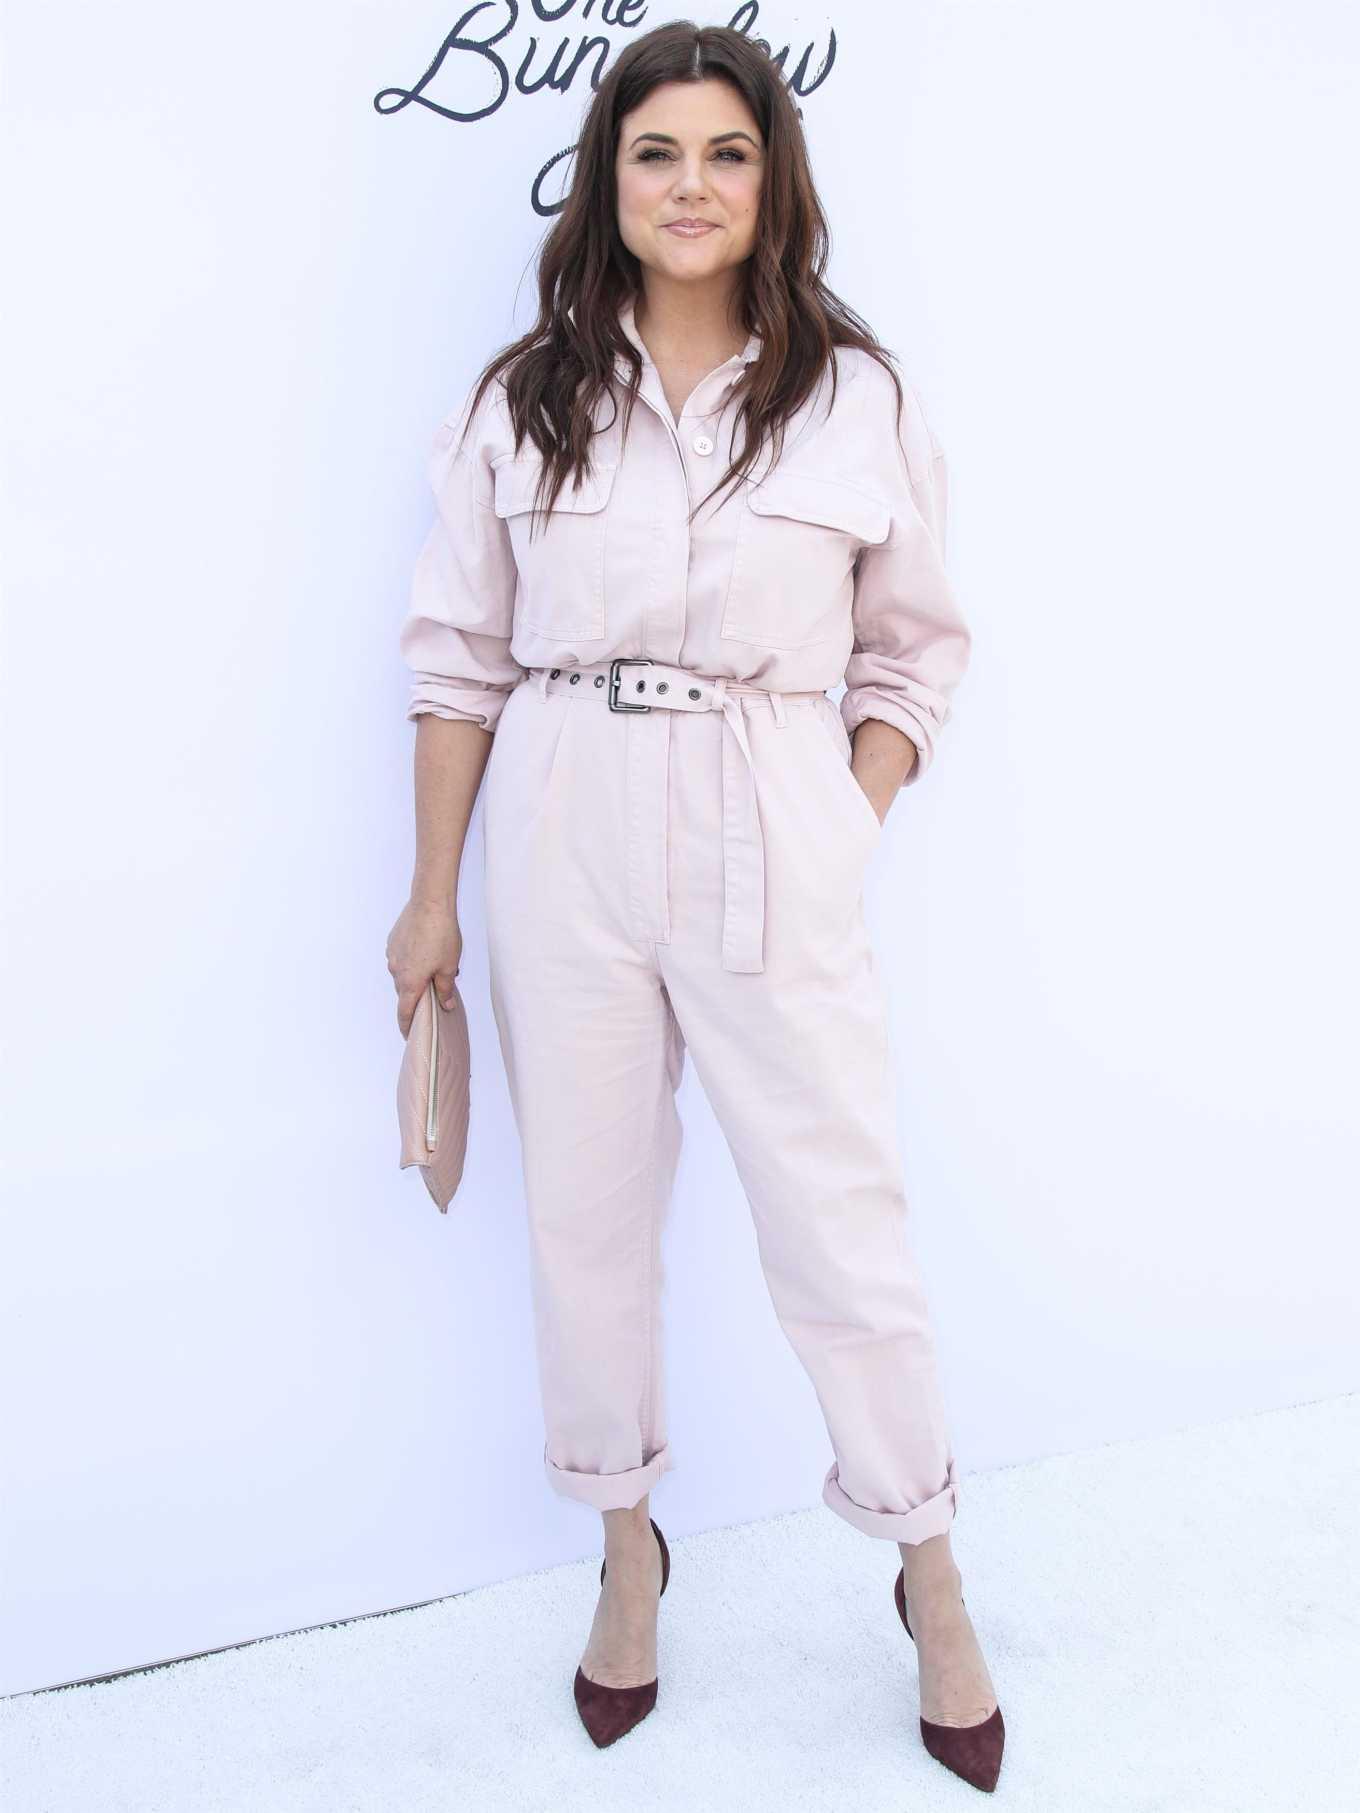 Tiffani Thiessen 2020 : Tiffani Thiessen – The Little Markets International Womens Day Event-13